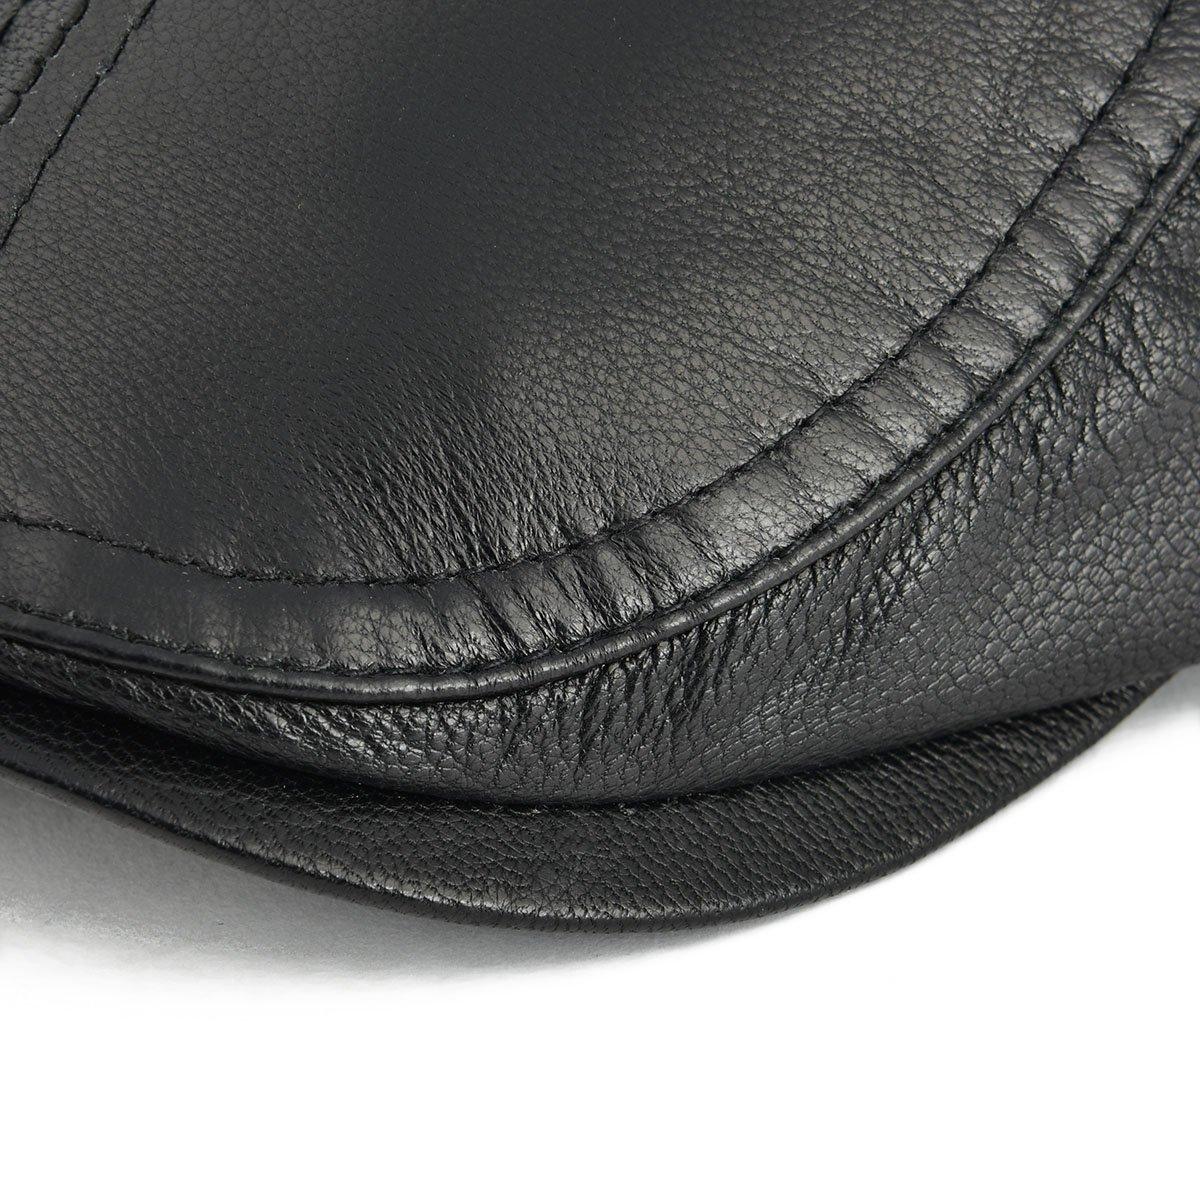 VOBOOM Men Women Adjustable Genuine Leather Ivy Cap Newsboy Hat 121